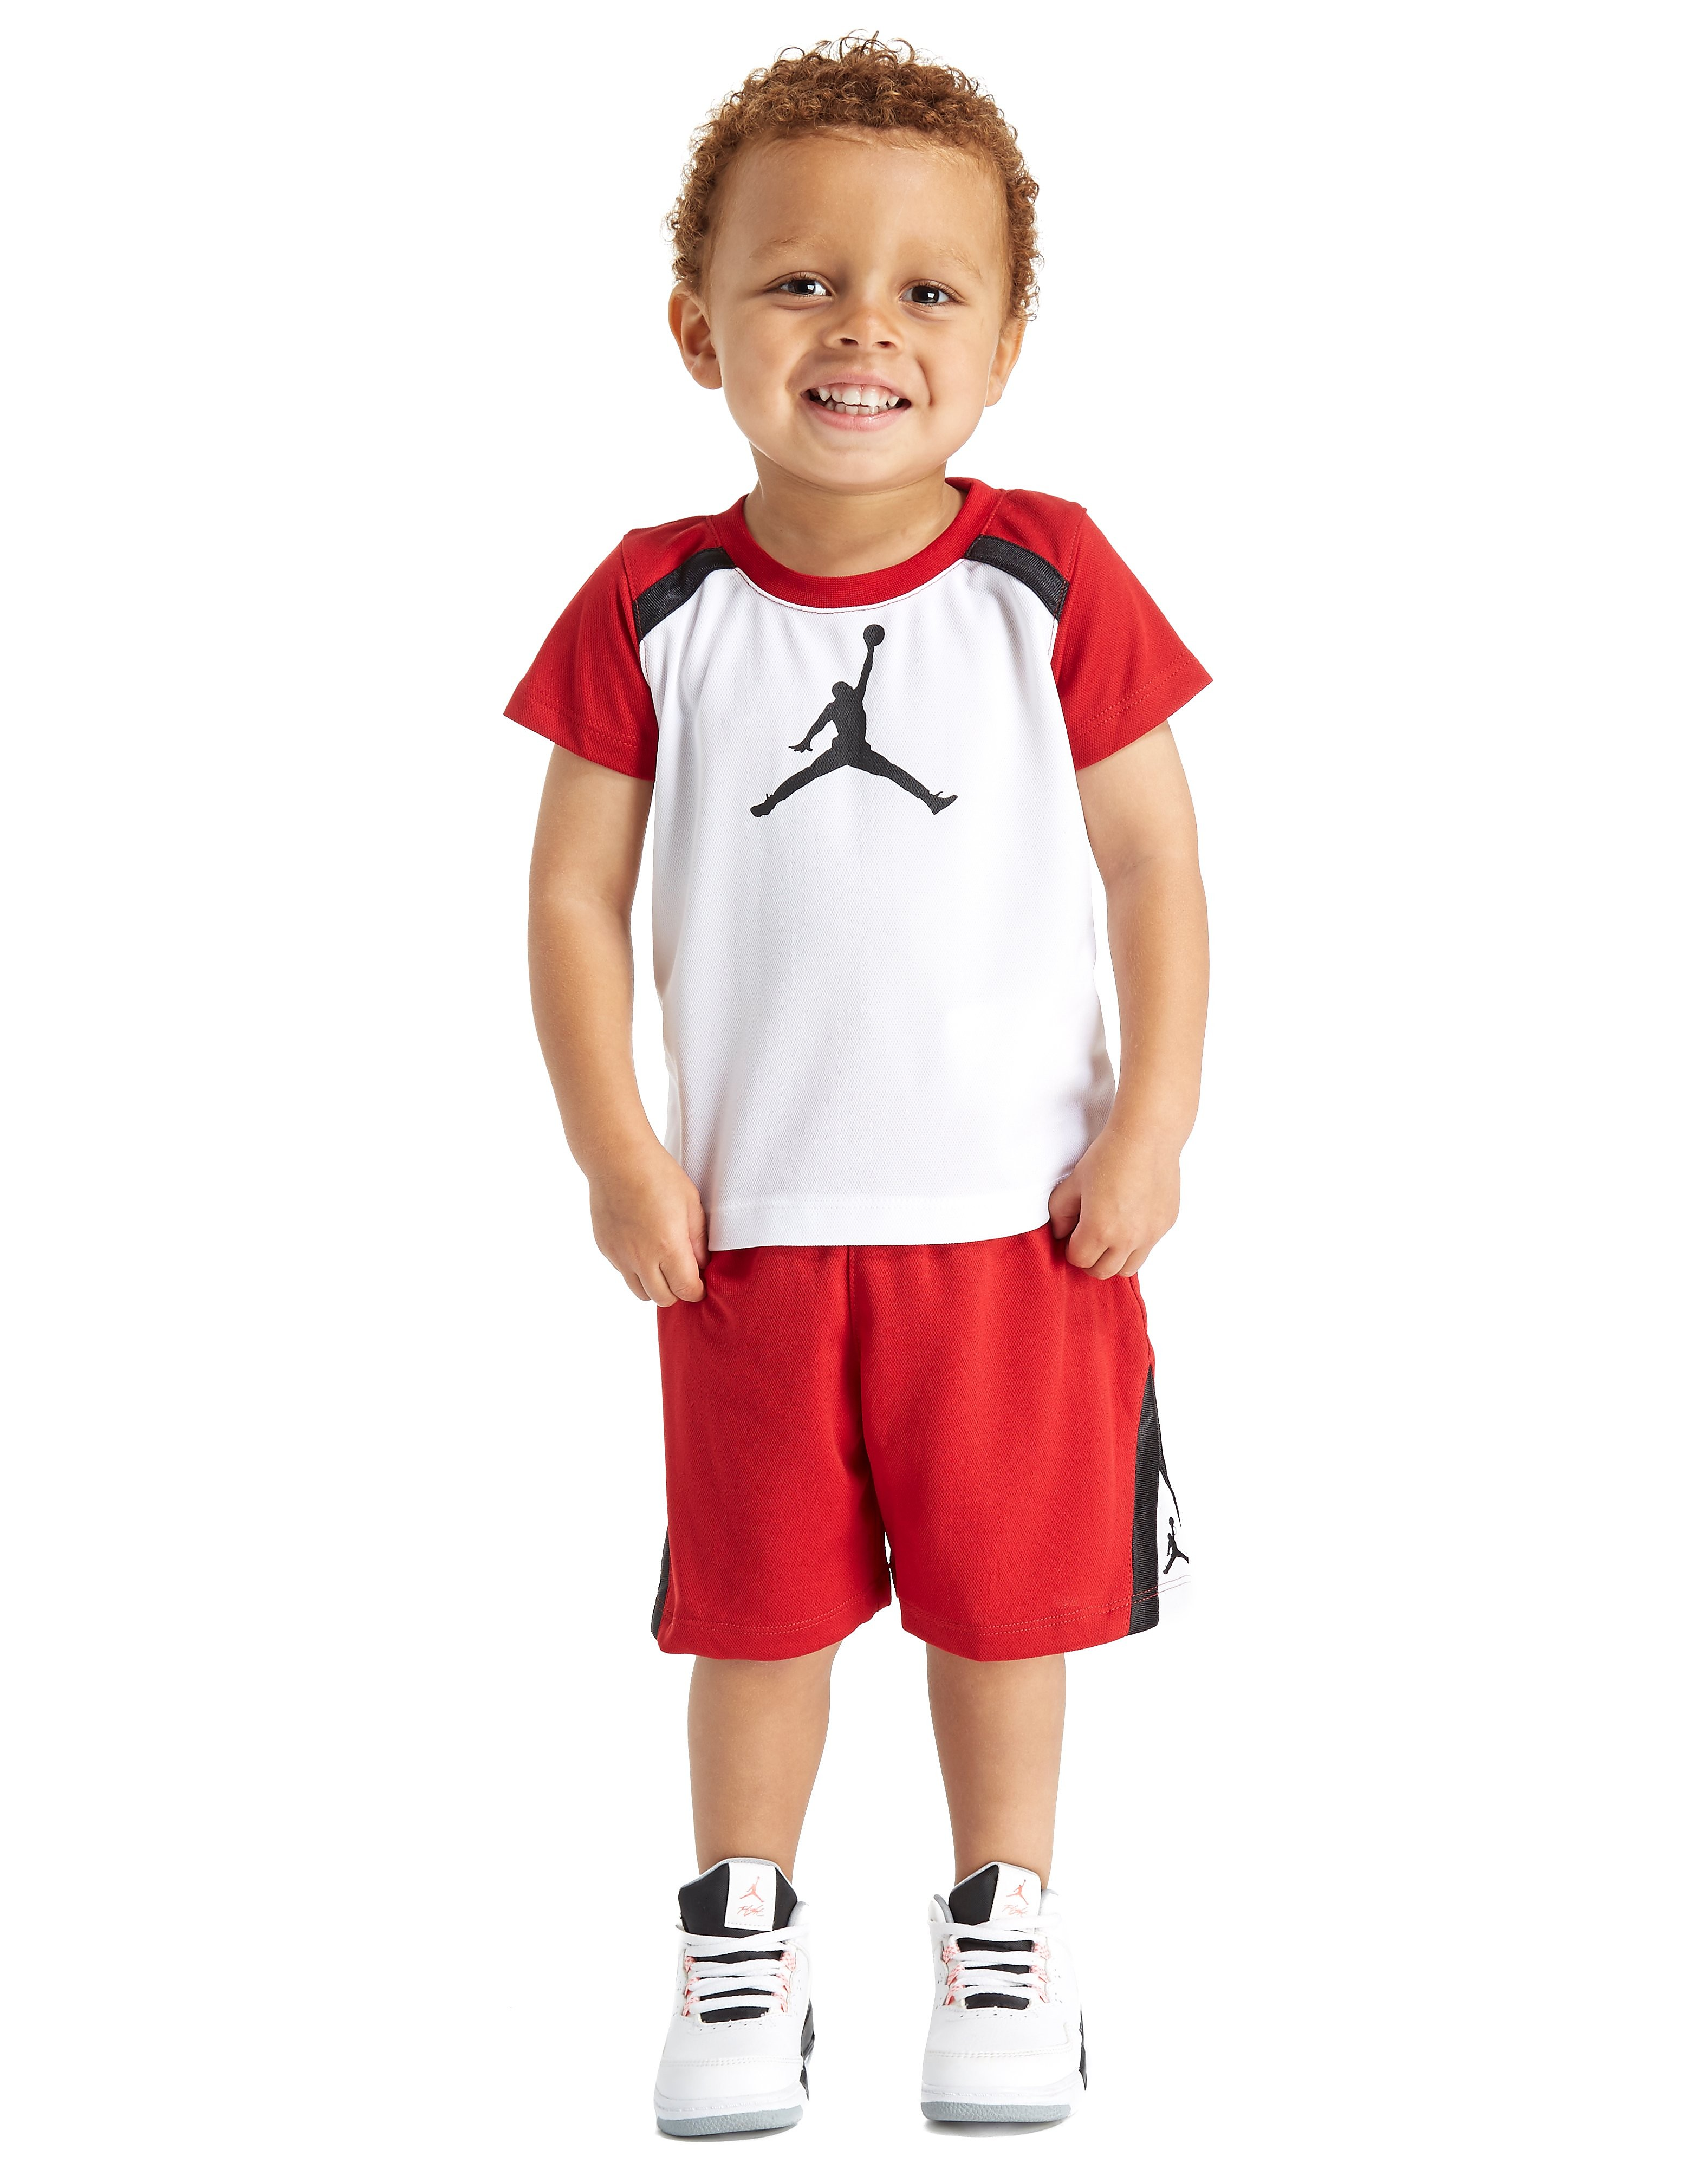 Jordan Court T-Shirt and Shorts Set Infant